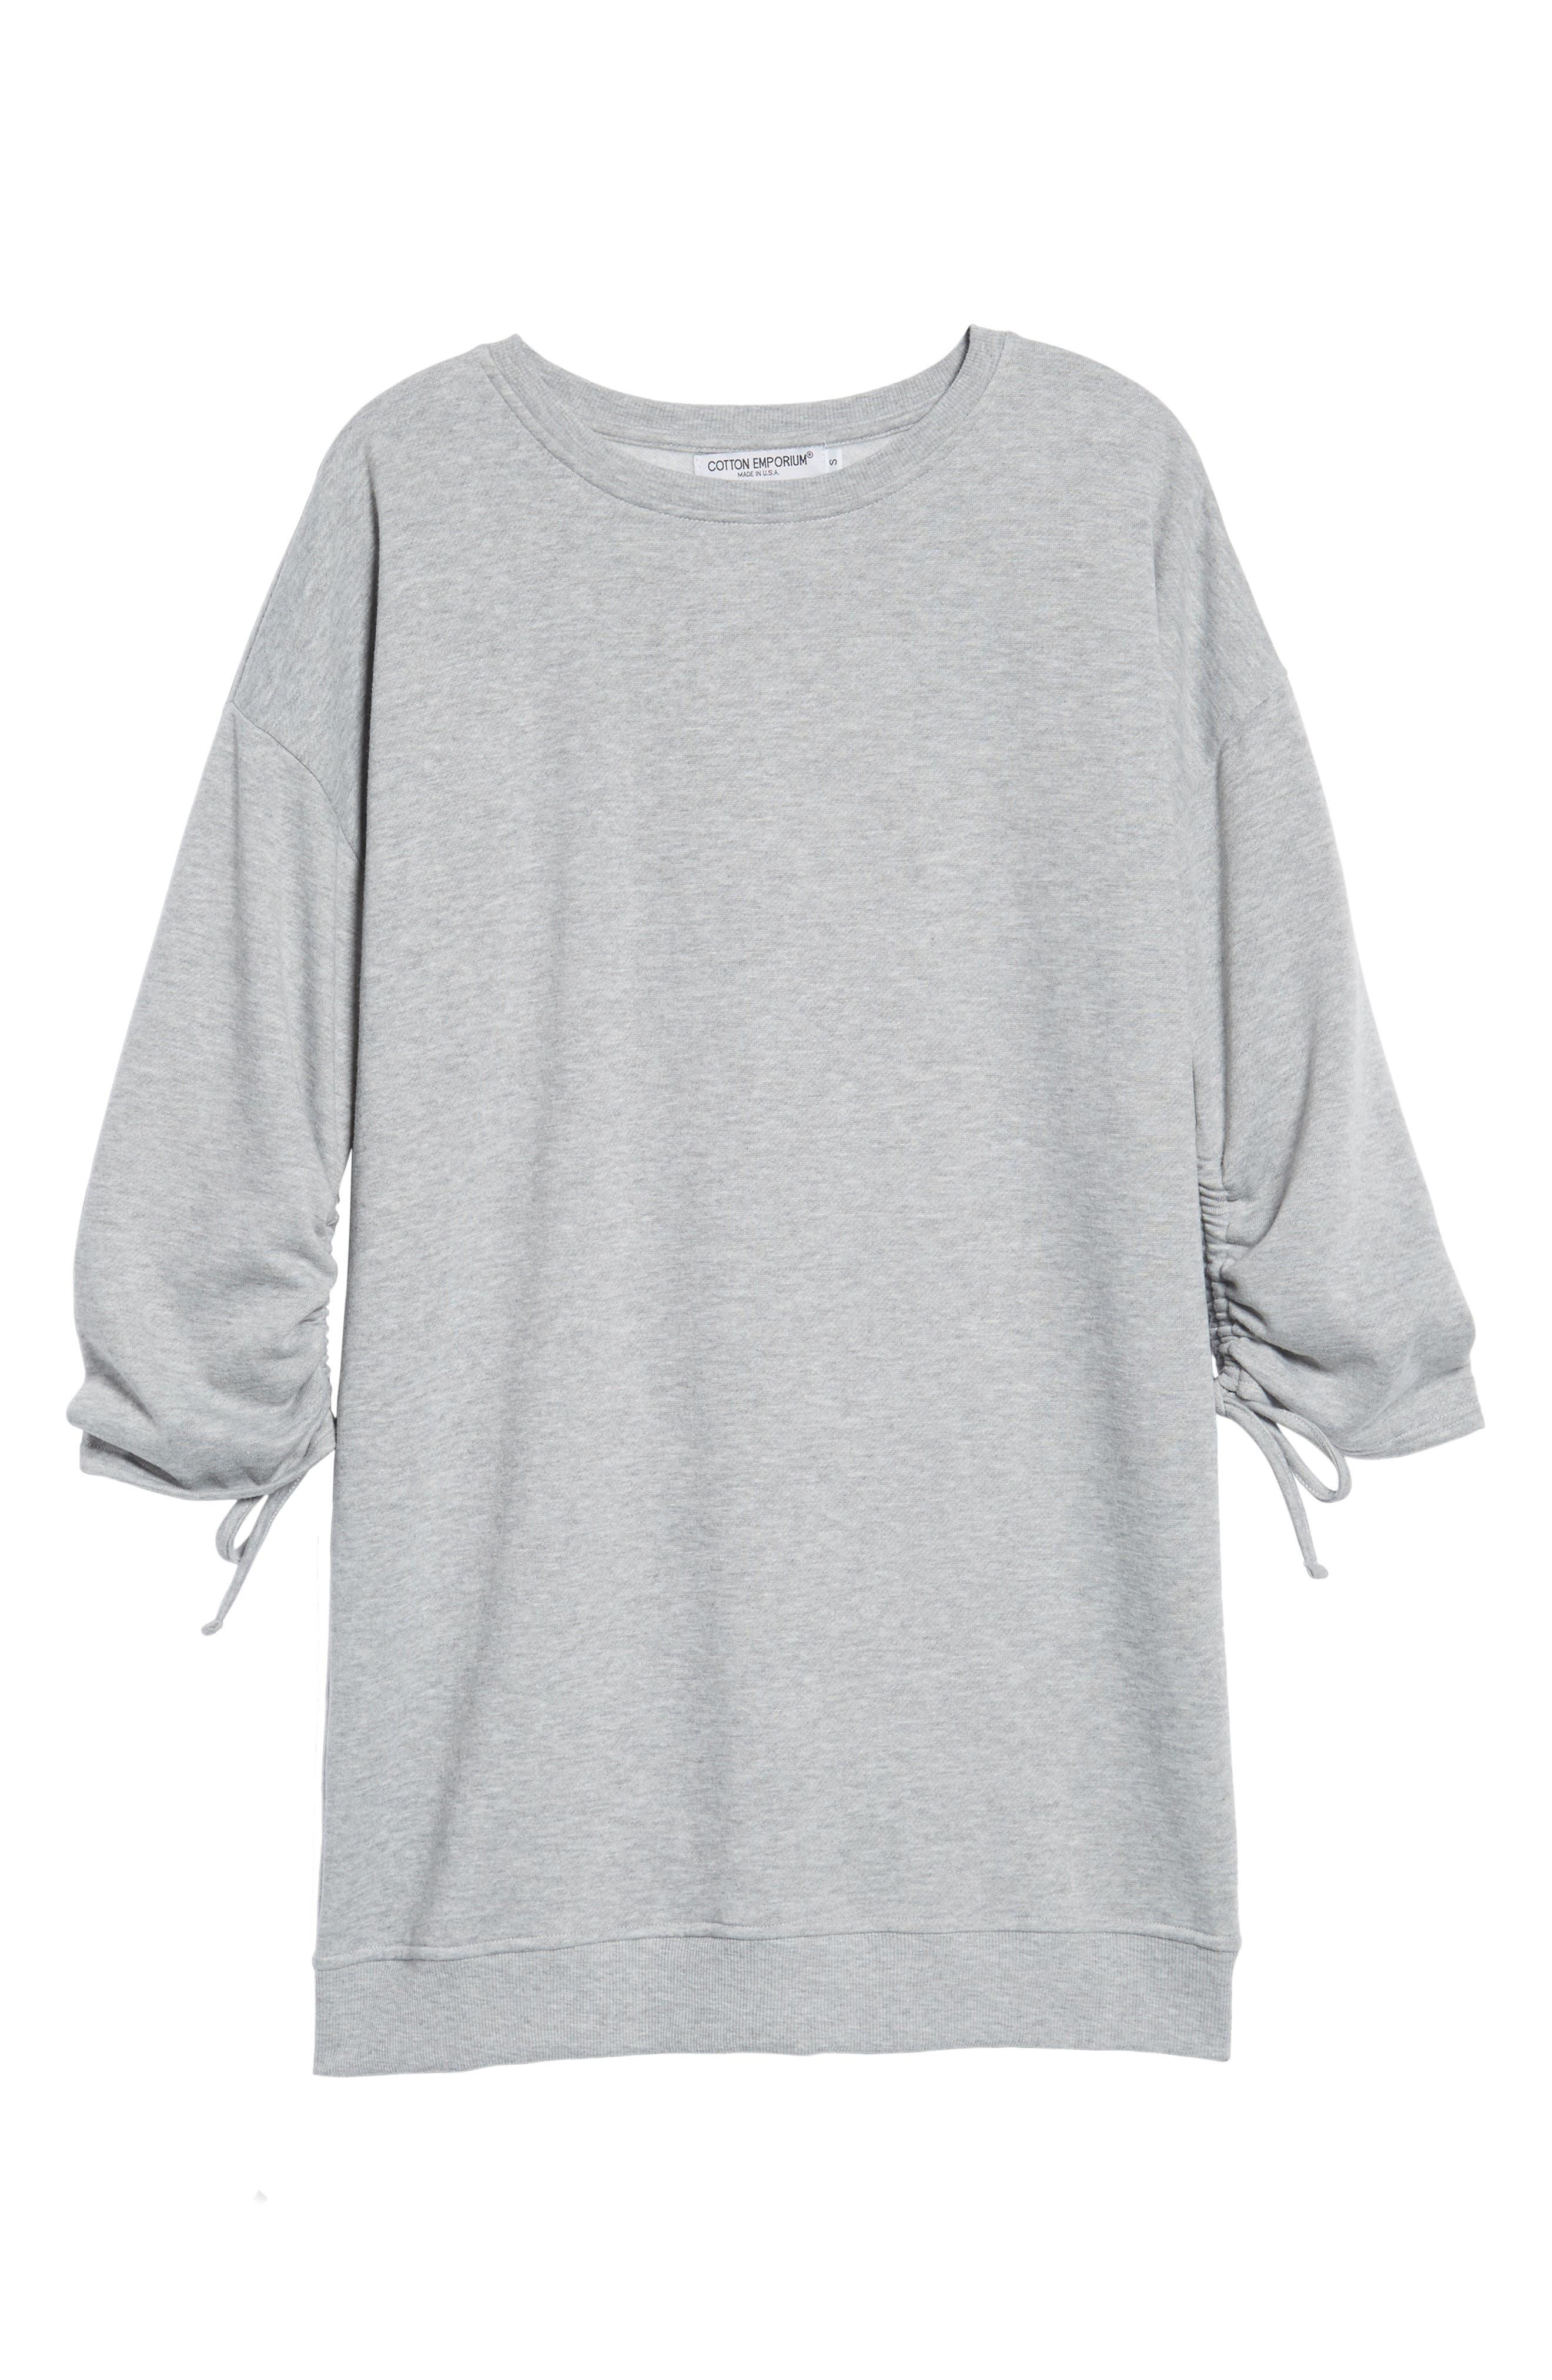 Ruched Sleeve Sweatshirt Dress,                             Alternate thumbnail 6, color,                             020